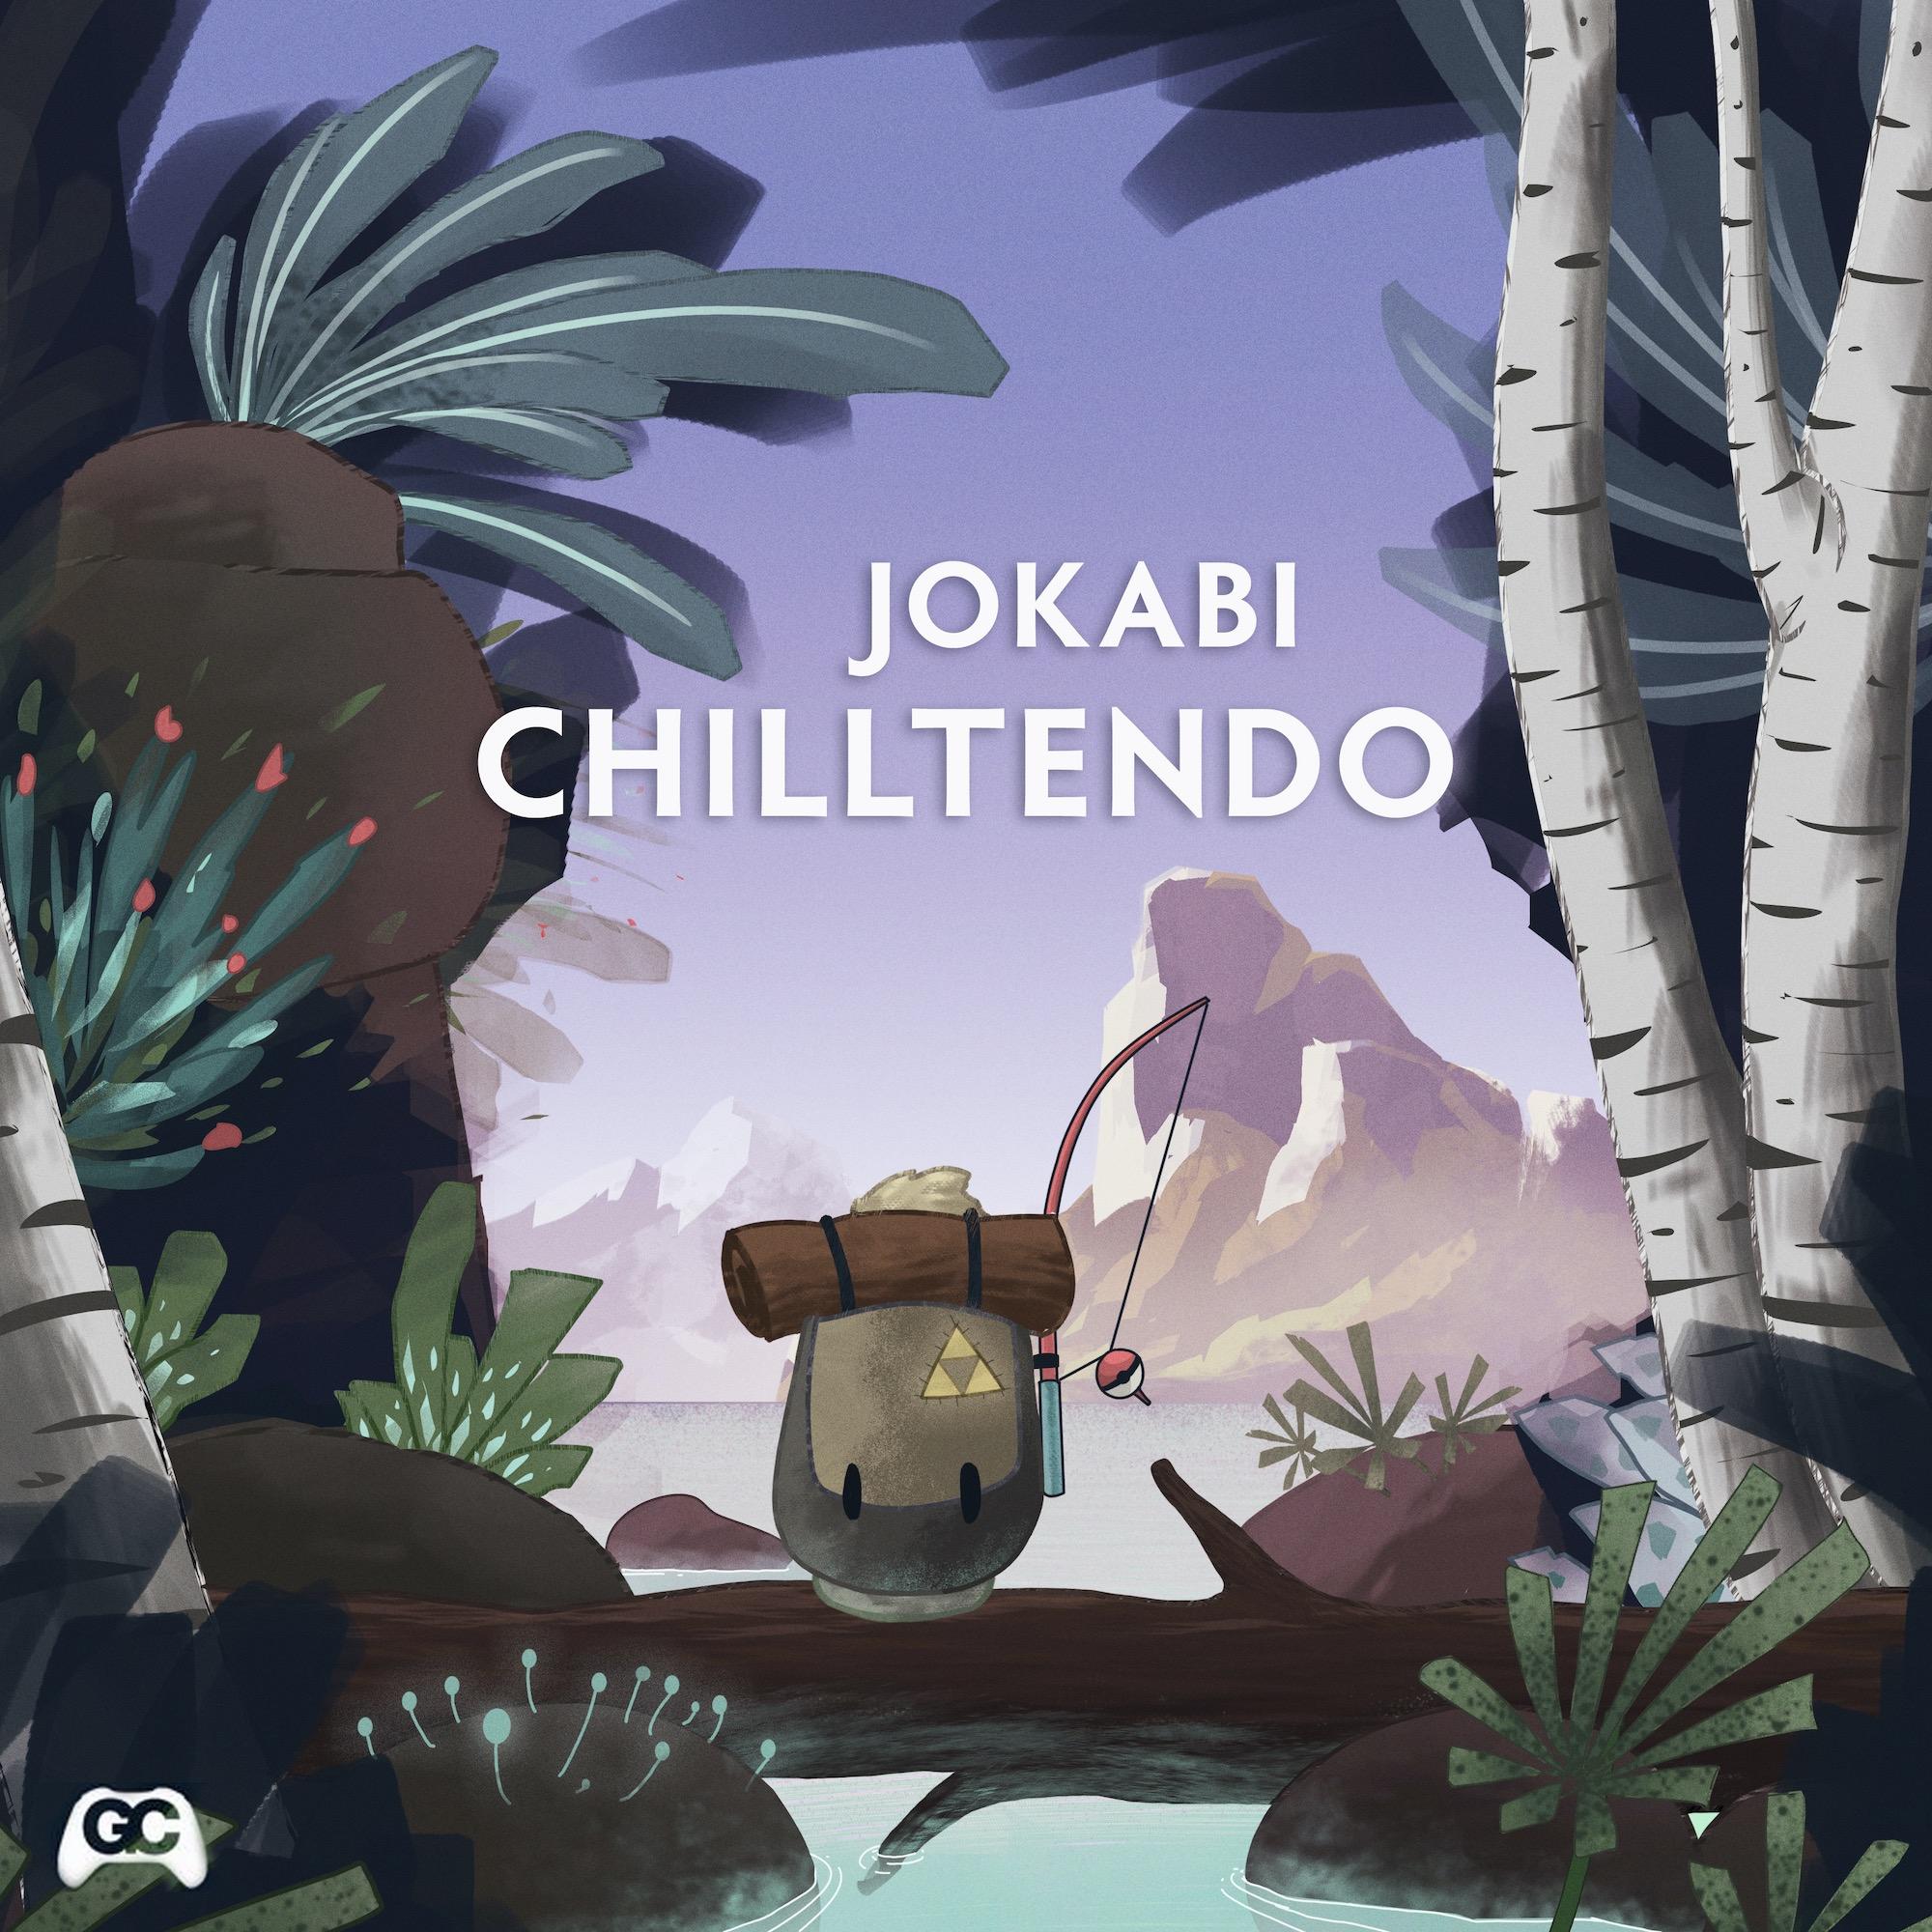 Jokabi - Chilltendo